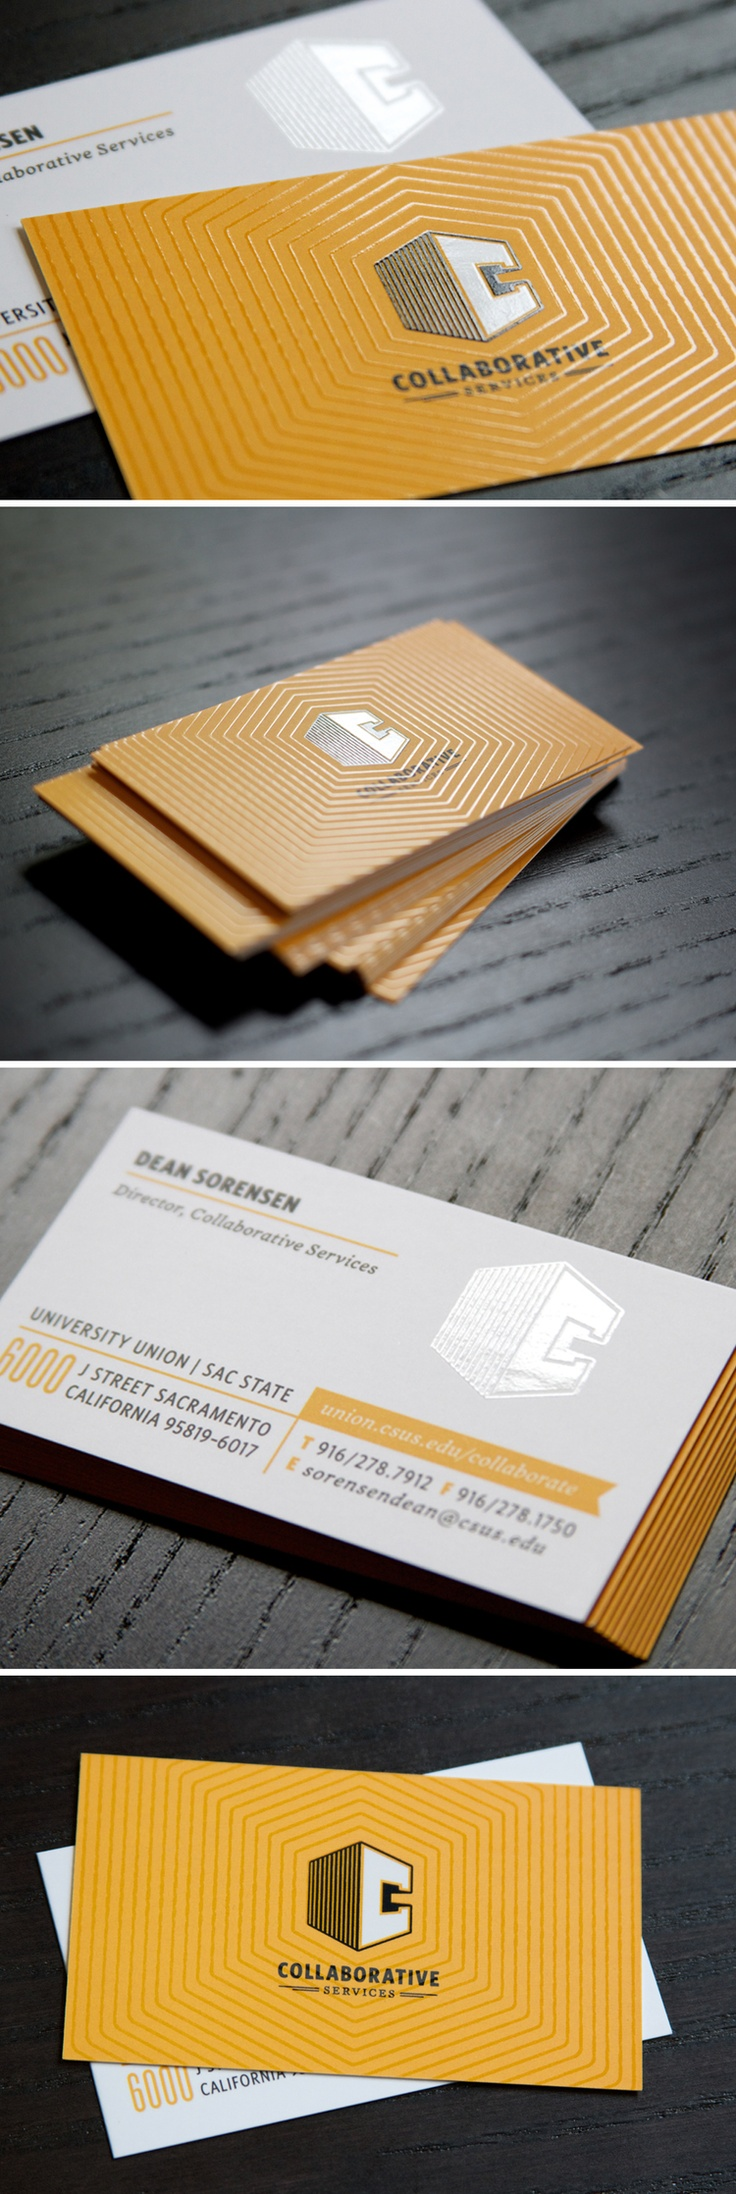 93 best Business Card // images on Pinterest | Carte de visite ...